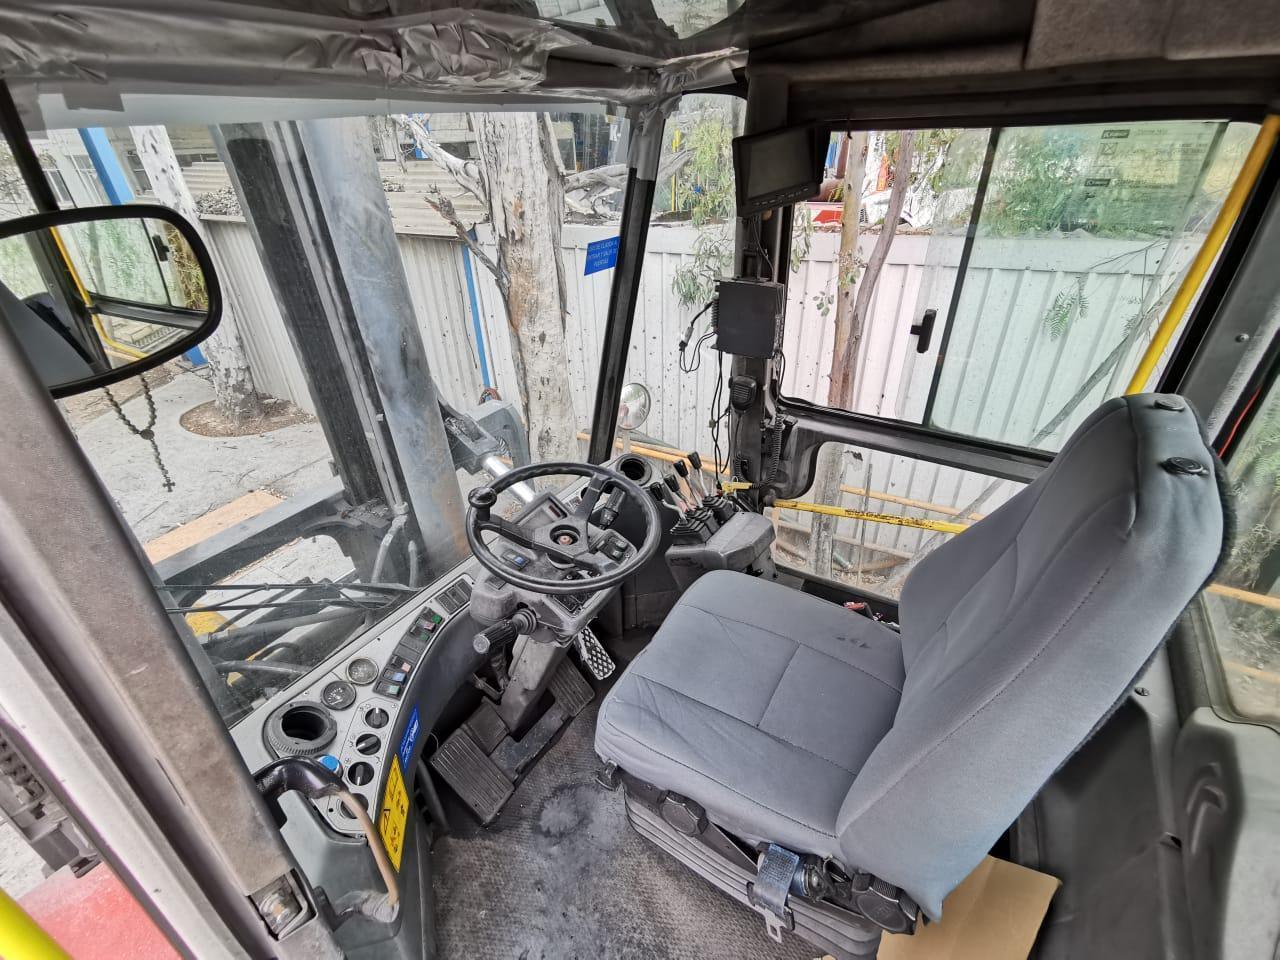 25 Ton Kalmar Forklift /Coil Lift Truck - Year 2009 K1